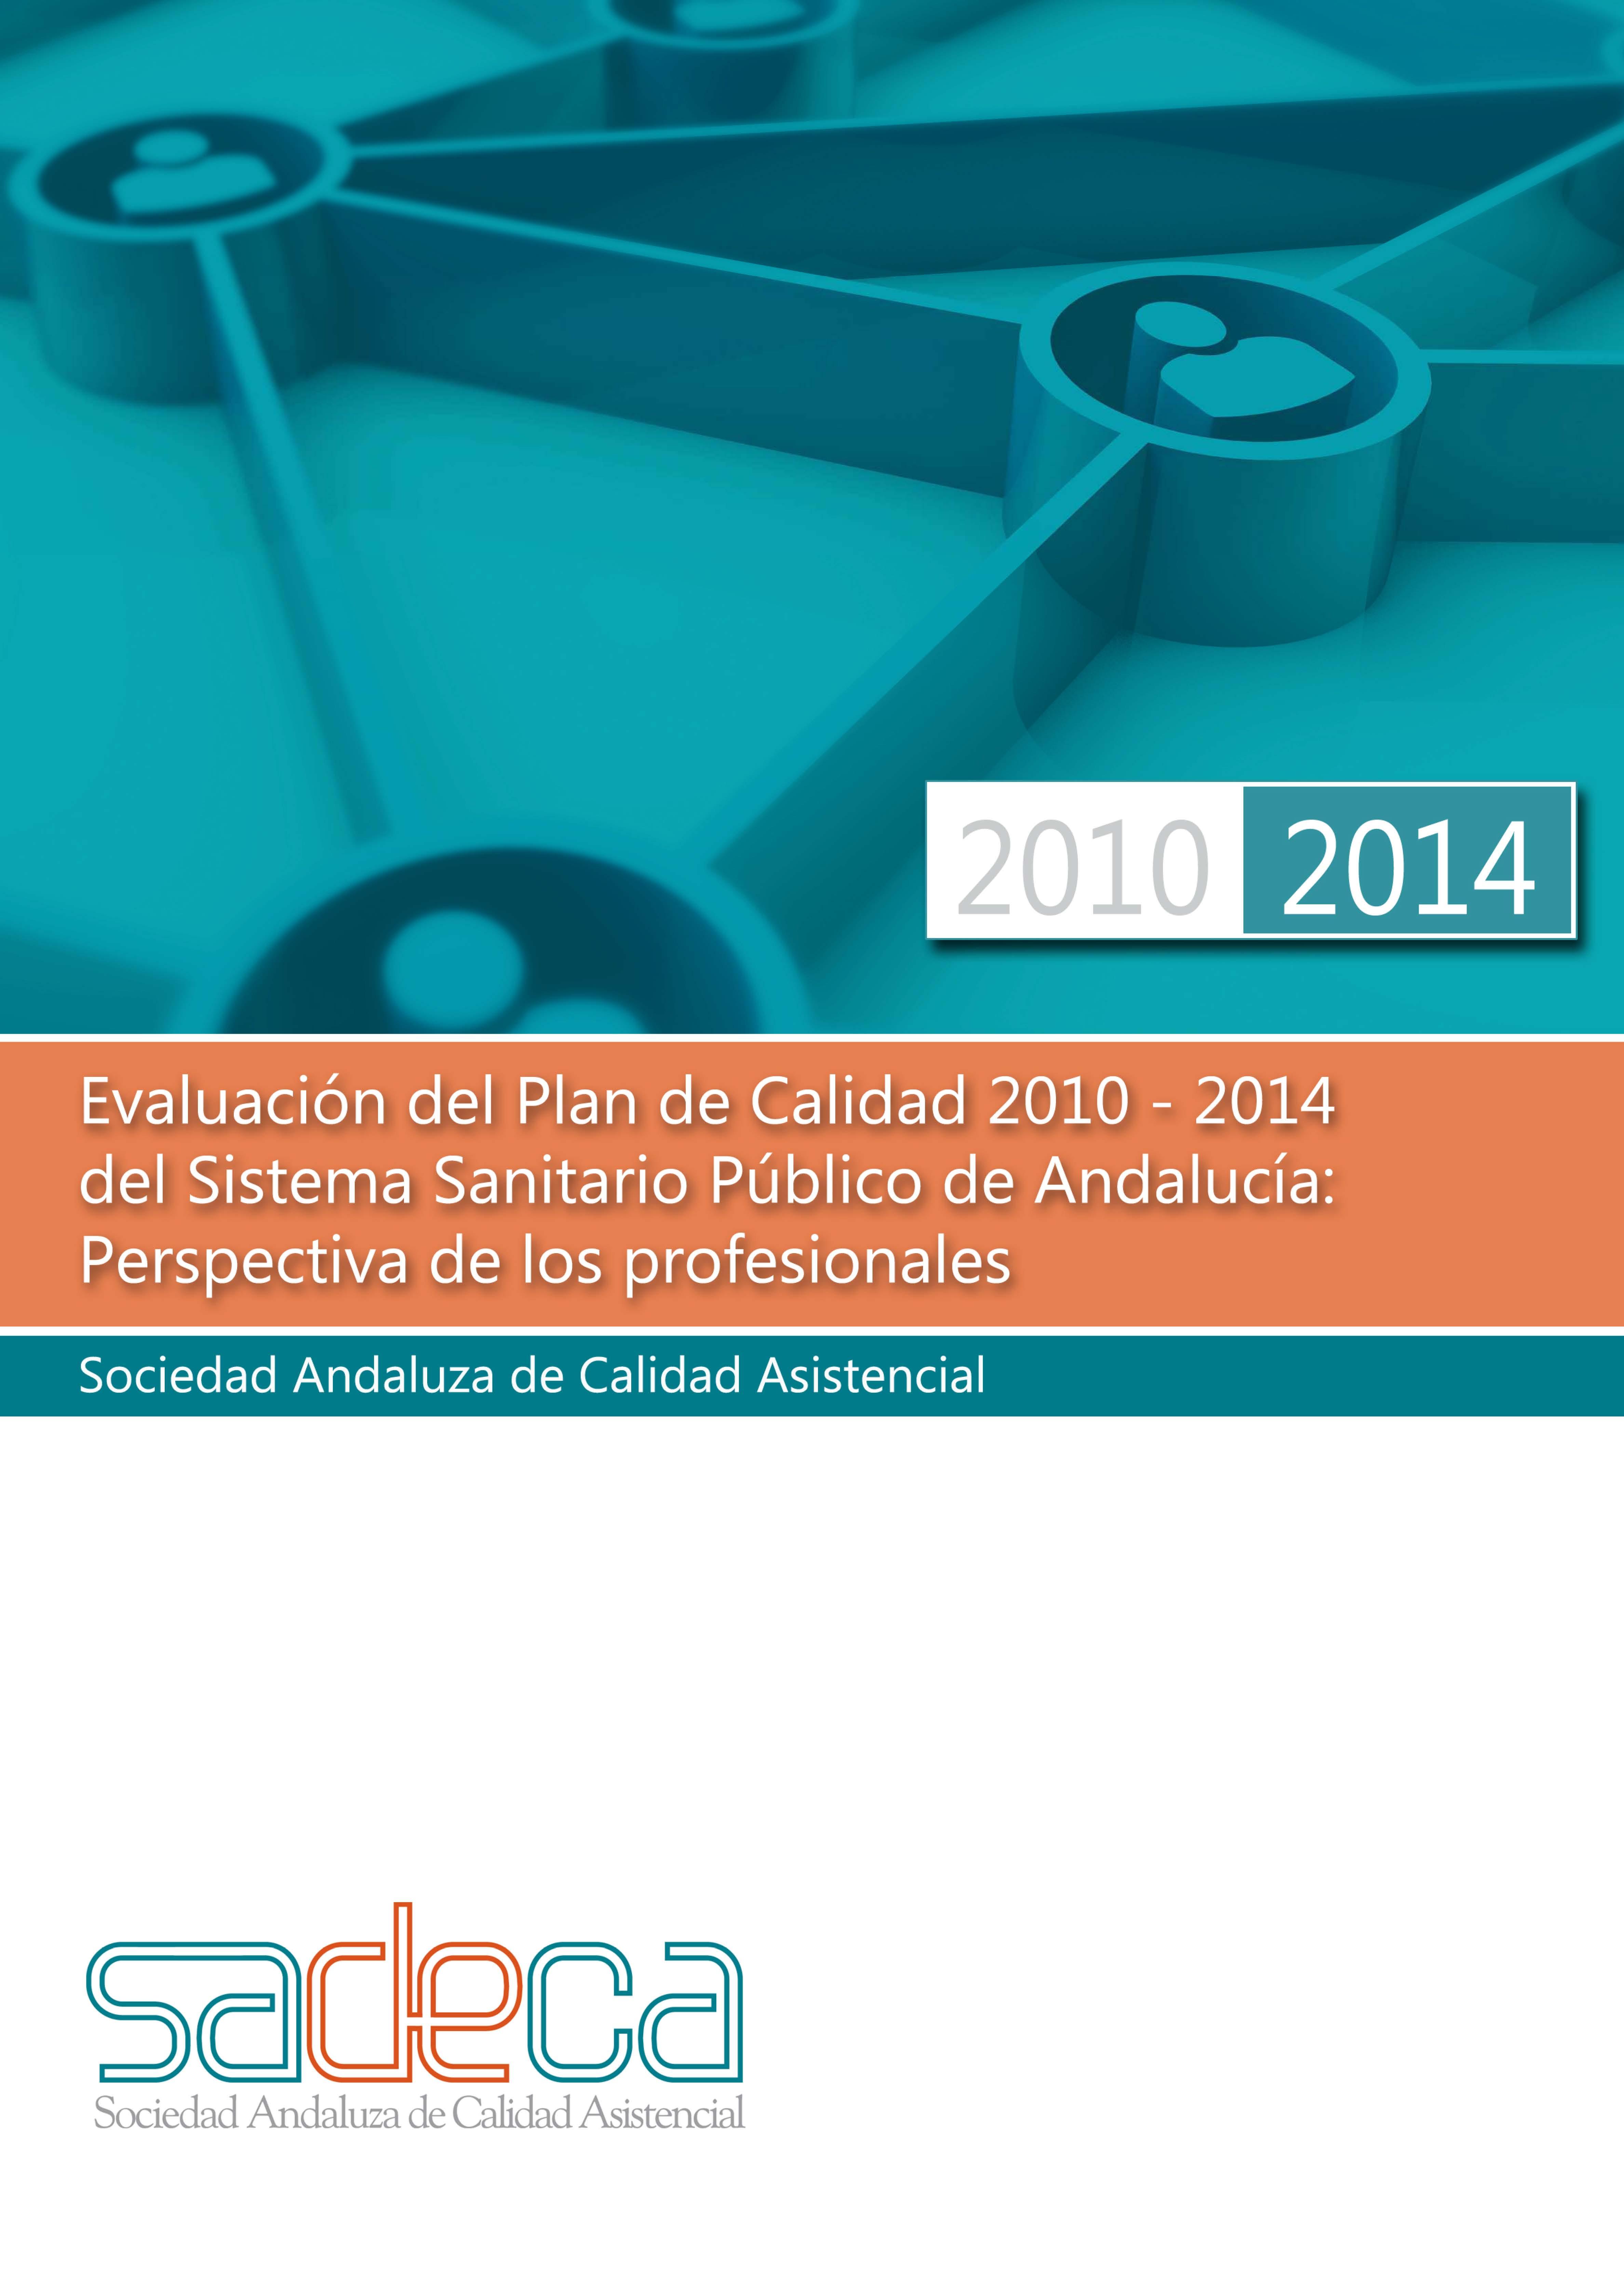 Informe sobre desarrollo competencial - Cirujanos/as